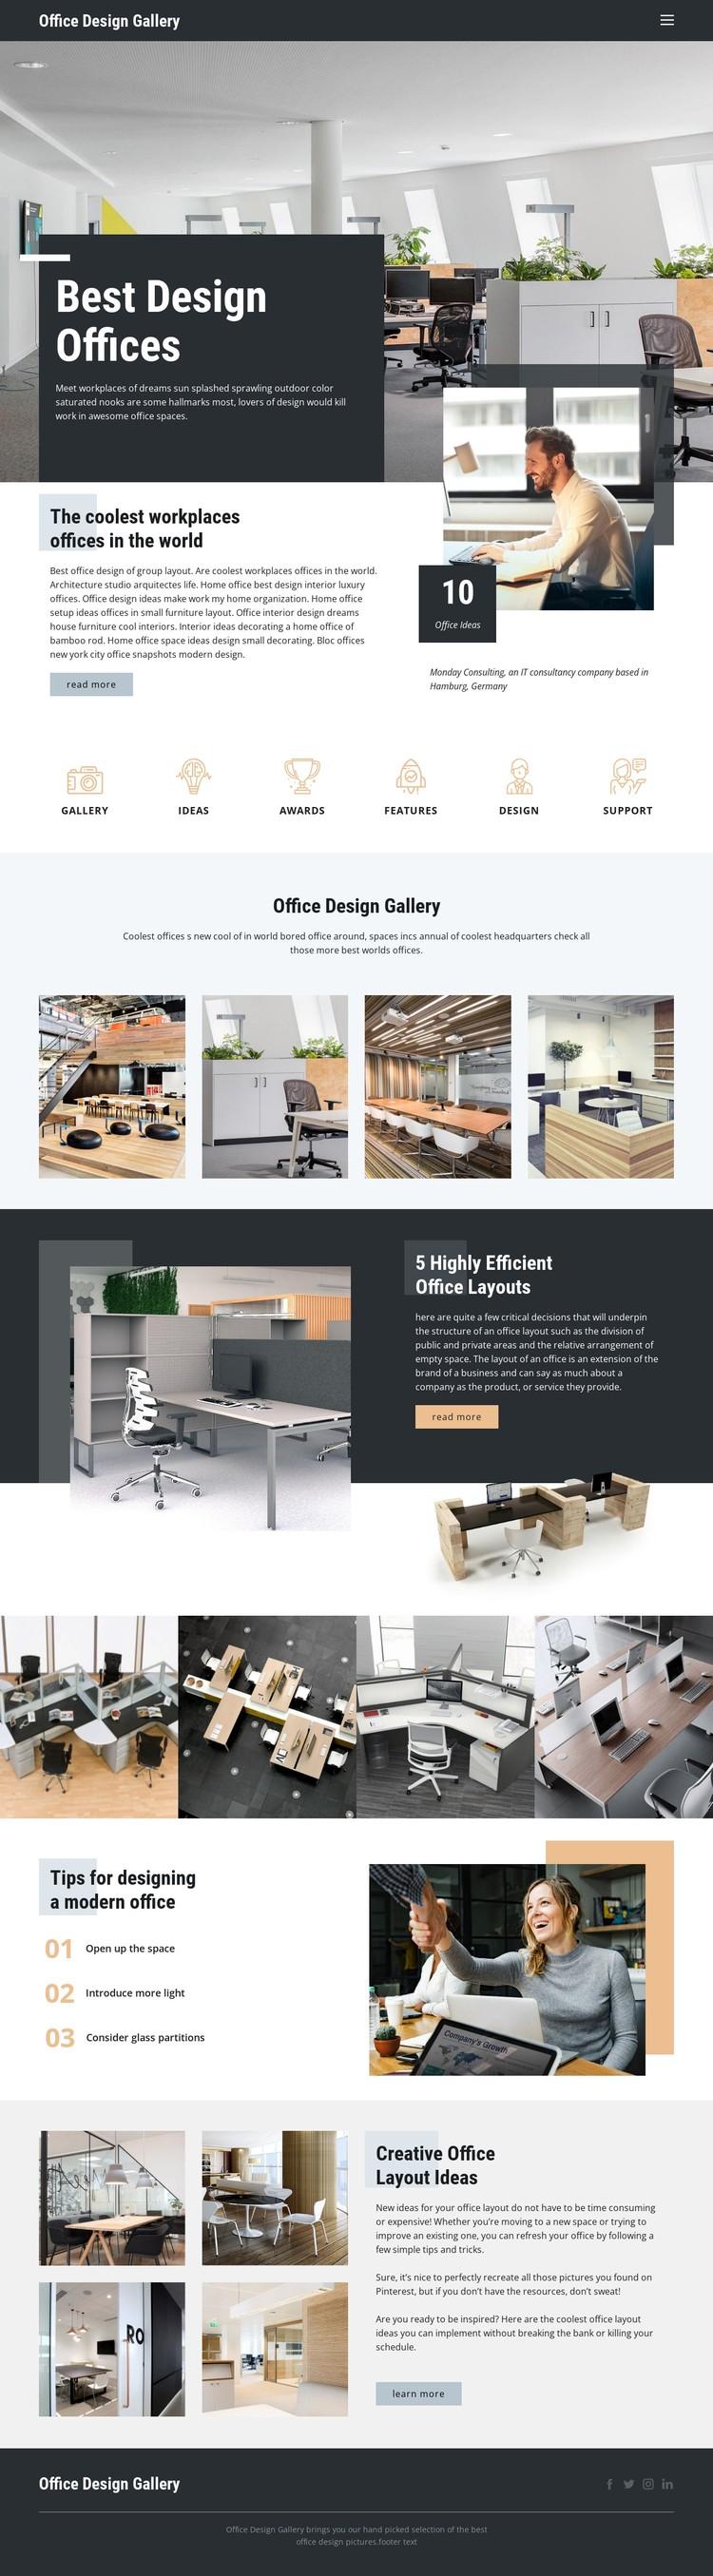 Best Design Offices Static Site Generator